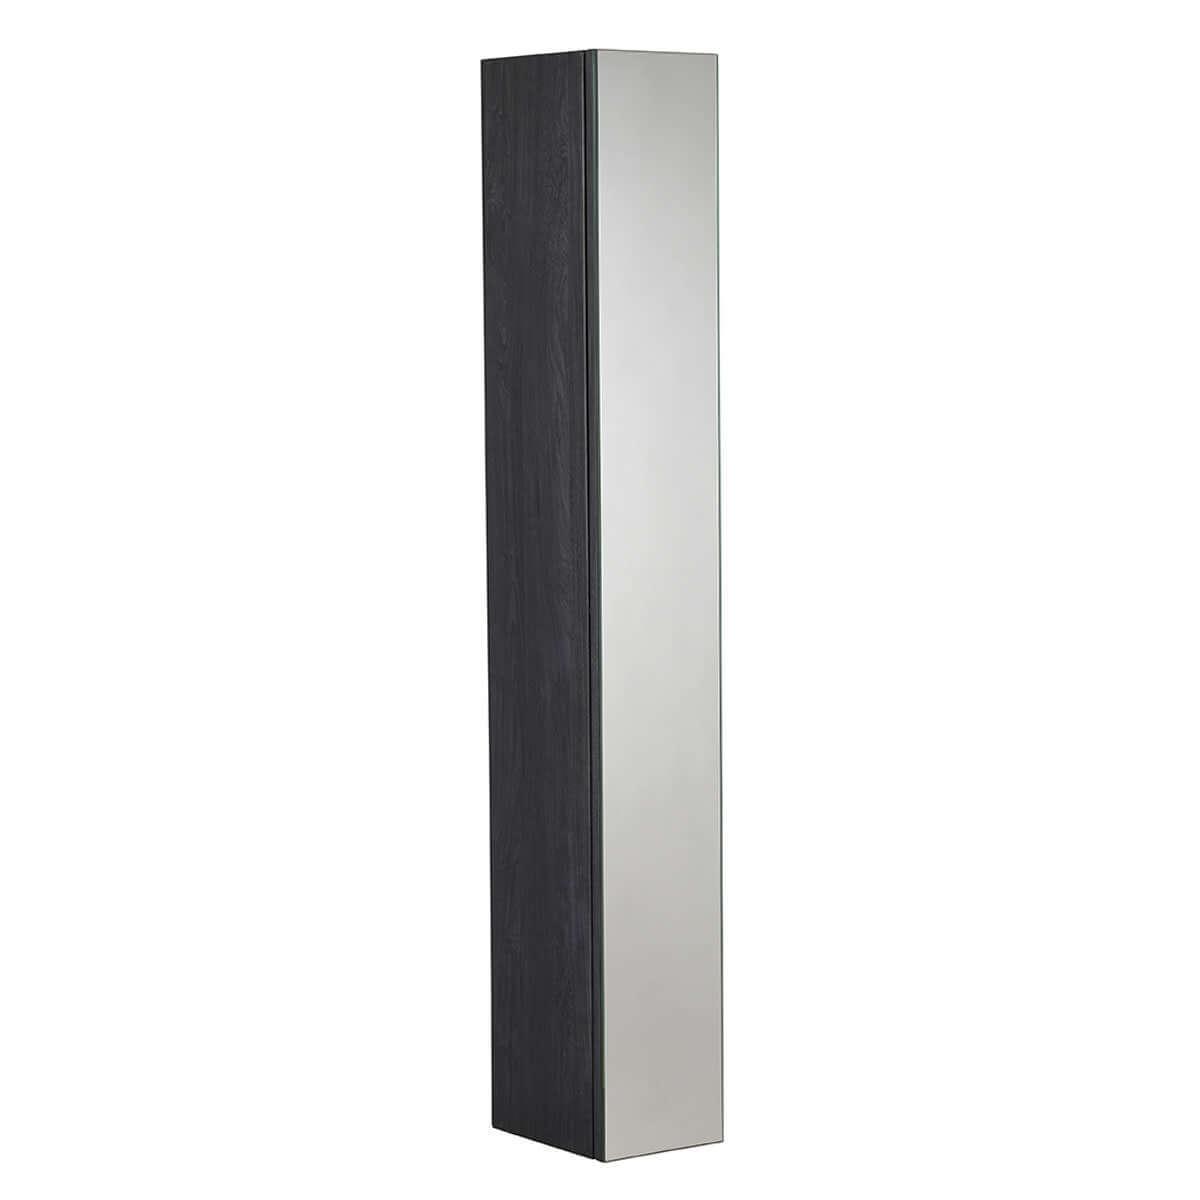 Roper Rhodes Scheme 1400 X 250mm Tall Mirrored Column Unit